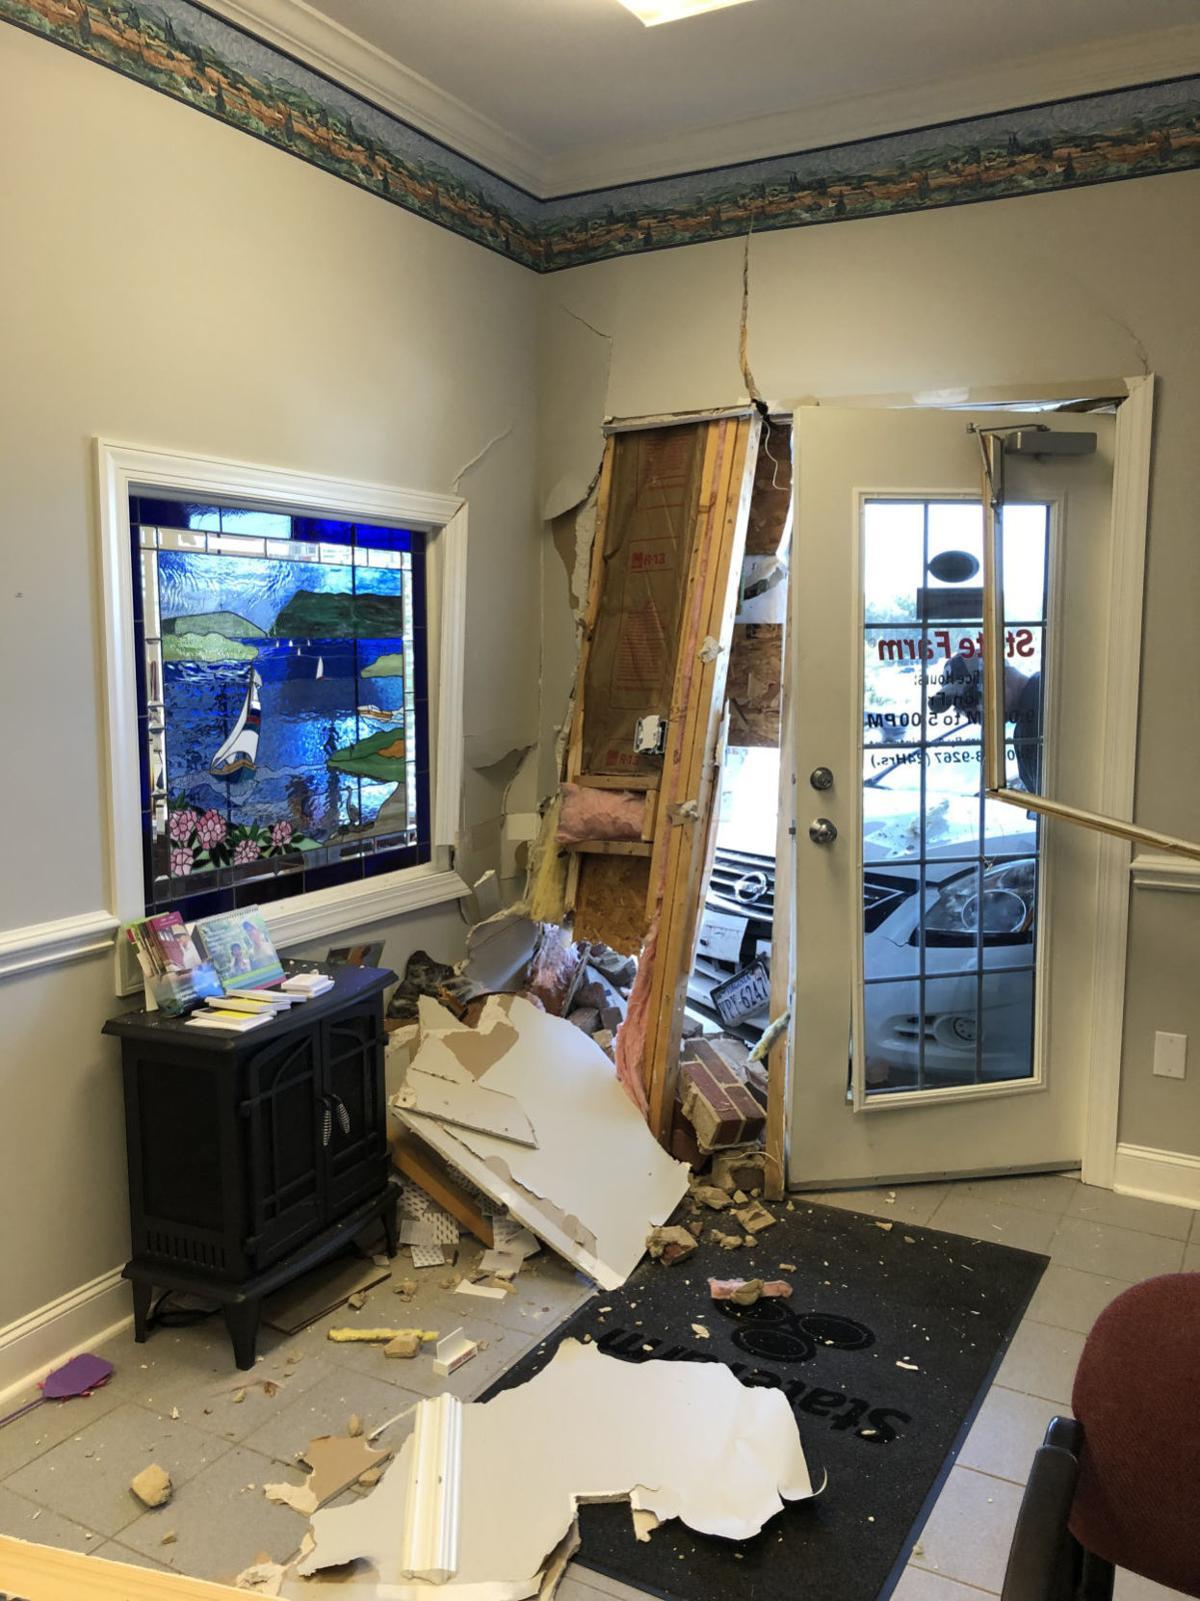 Insurance office sustains damage after crash